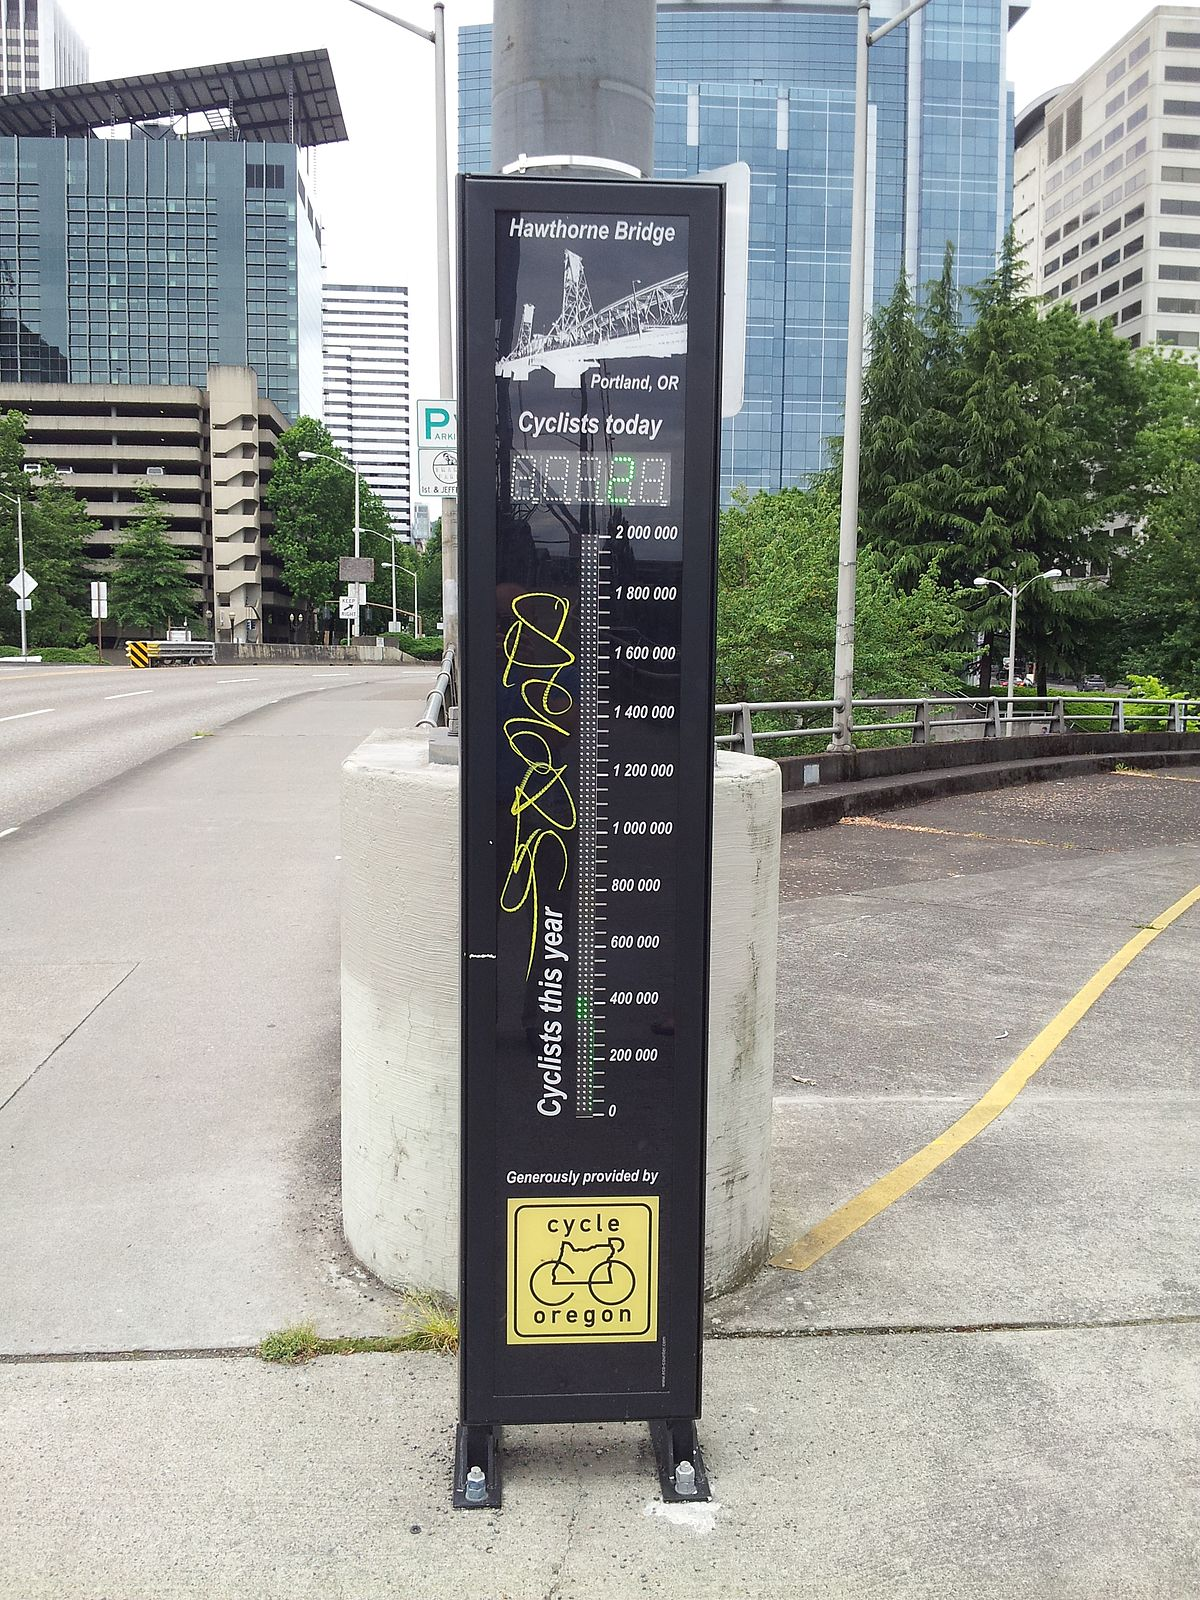 Cost U Less >> Hawthorne Bridge bicycle counter - Wikipedia